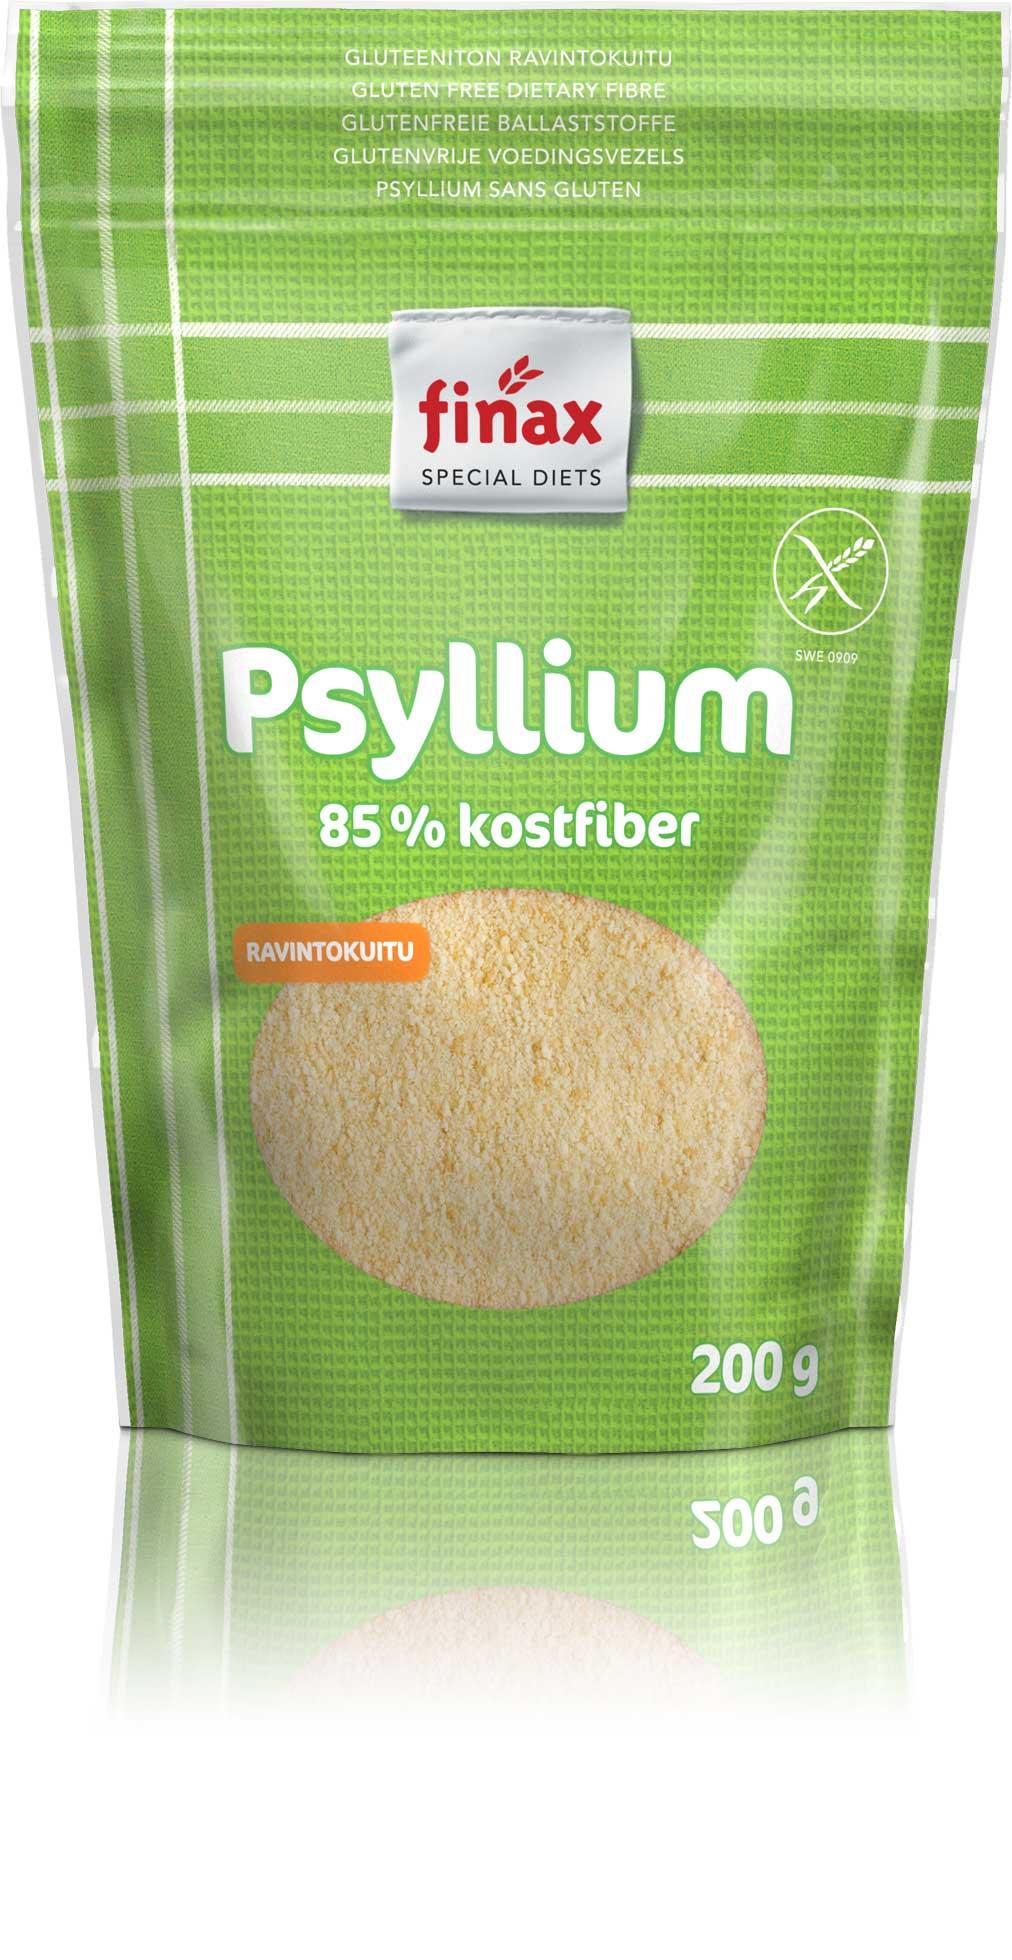 Finax Psyllium